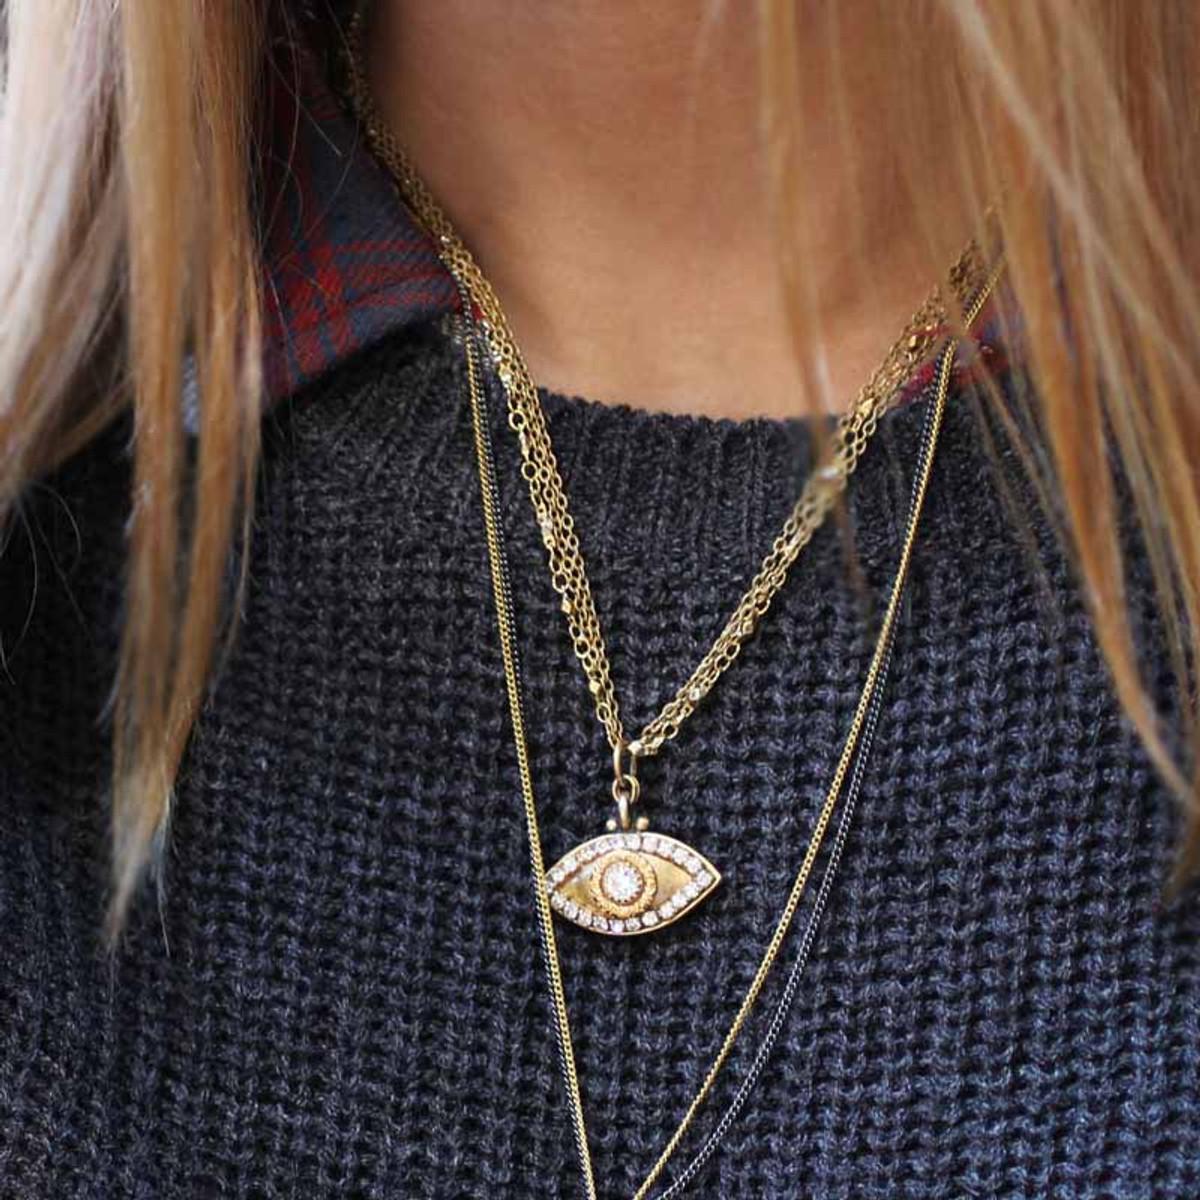 Evil Eye Necklace - Gold, Medium Eye With Crystal Edges & Center